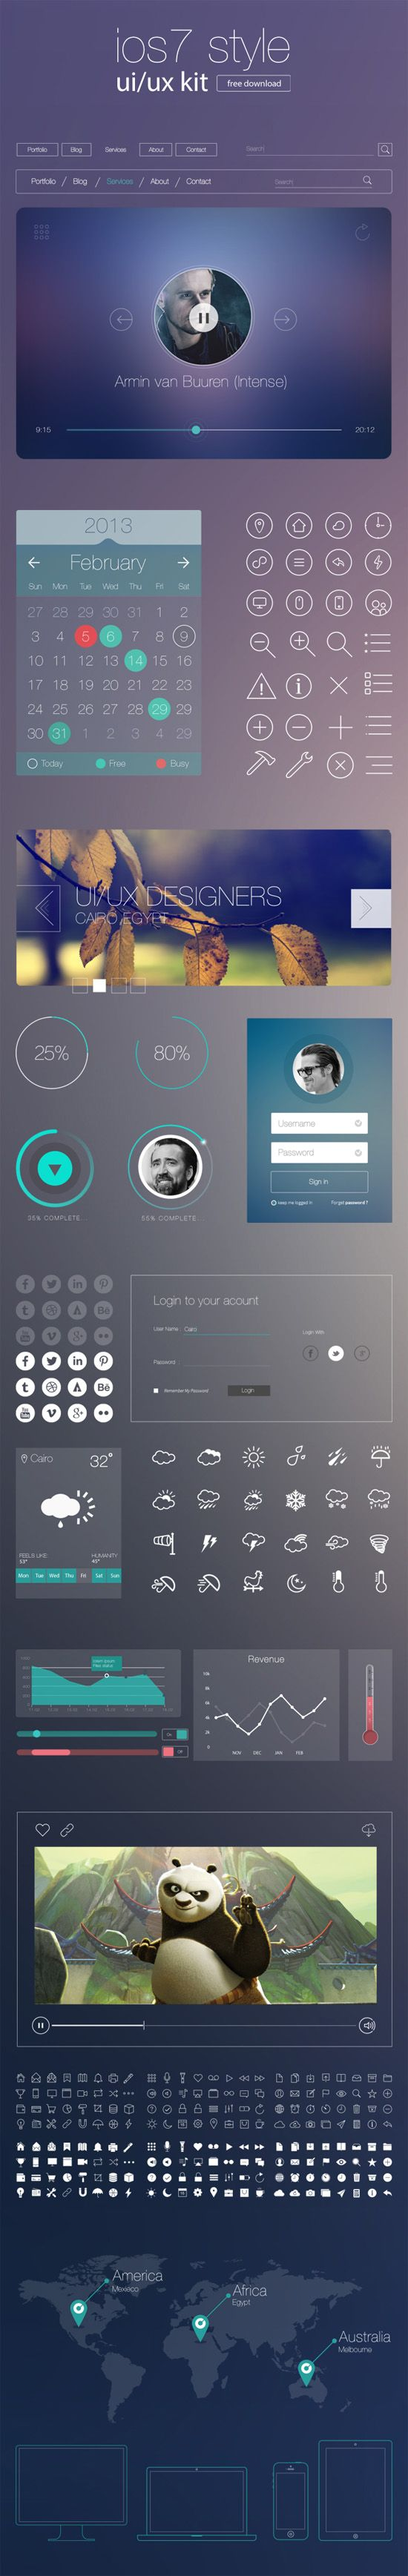 iOS7 style UI Kit : Freebie #uikit #uidesign #webdesign #elements #ios7